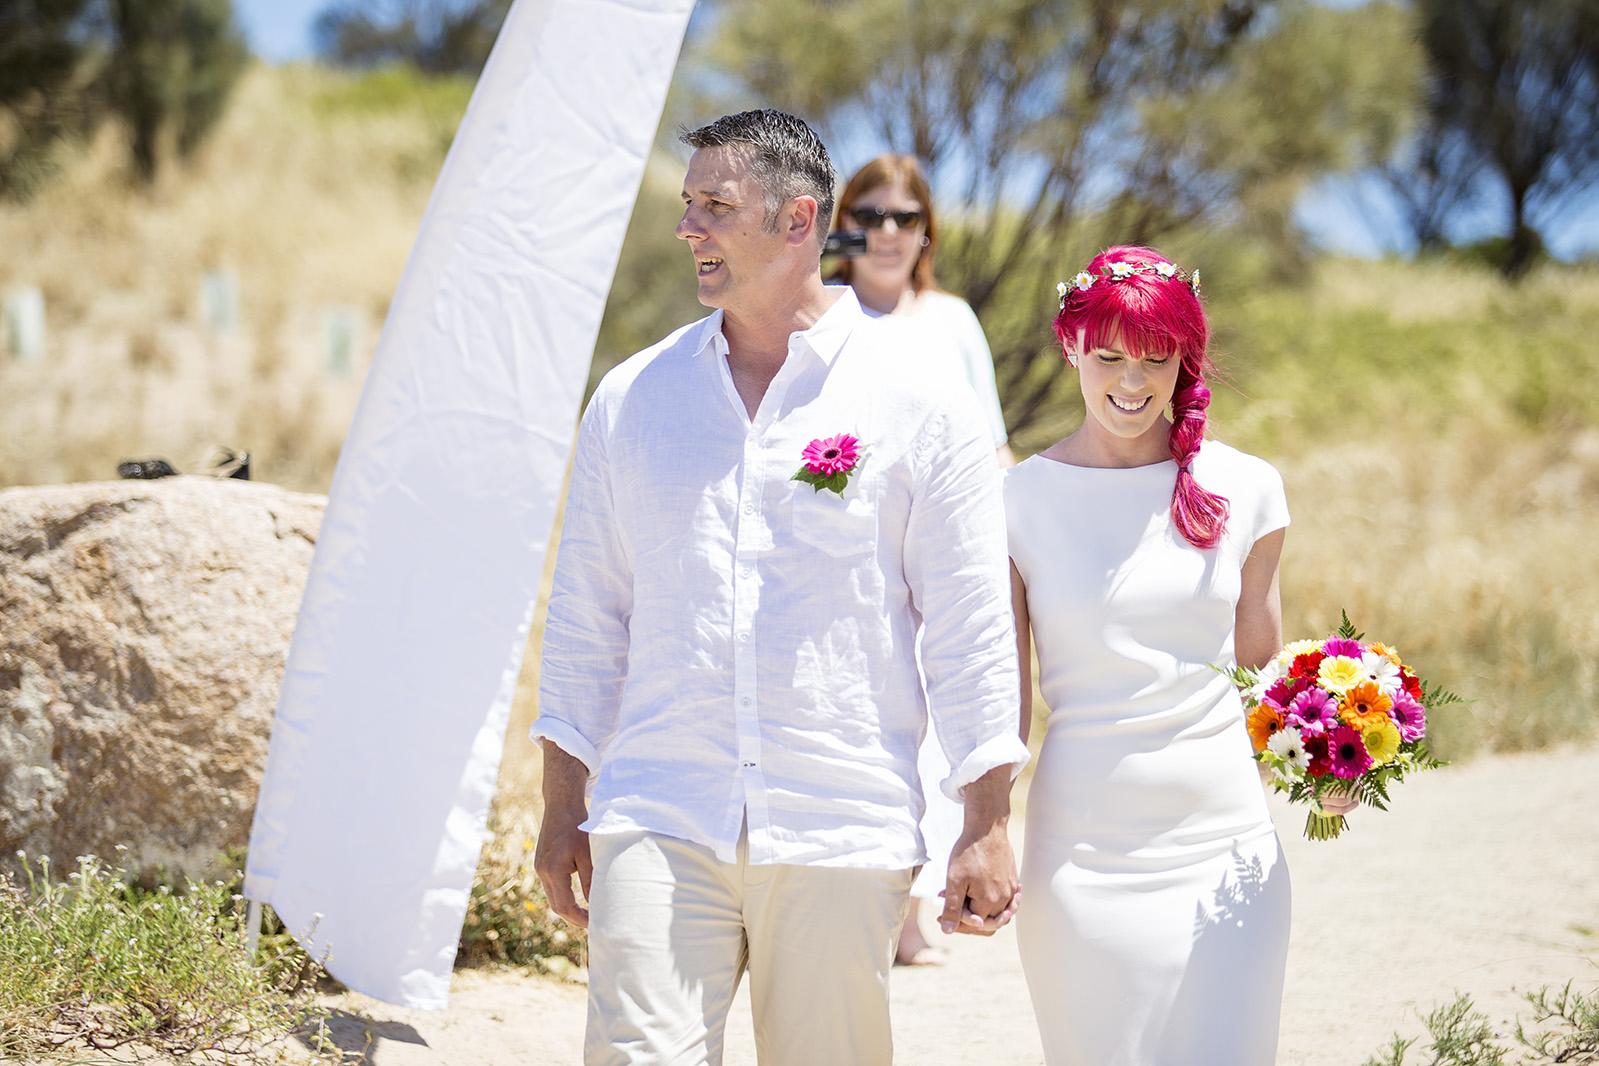 Victor Harbour Wedding Photography 027 beach wedding.jpg